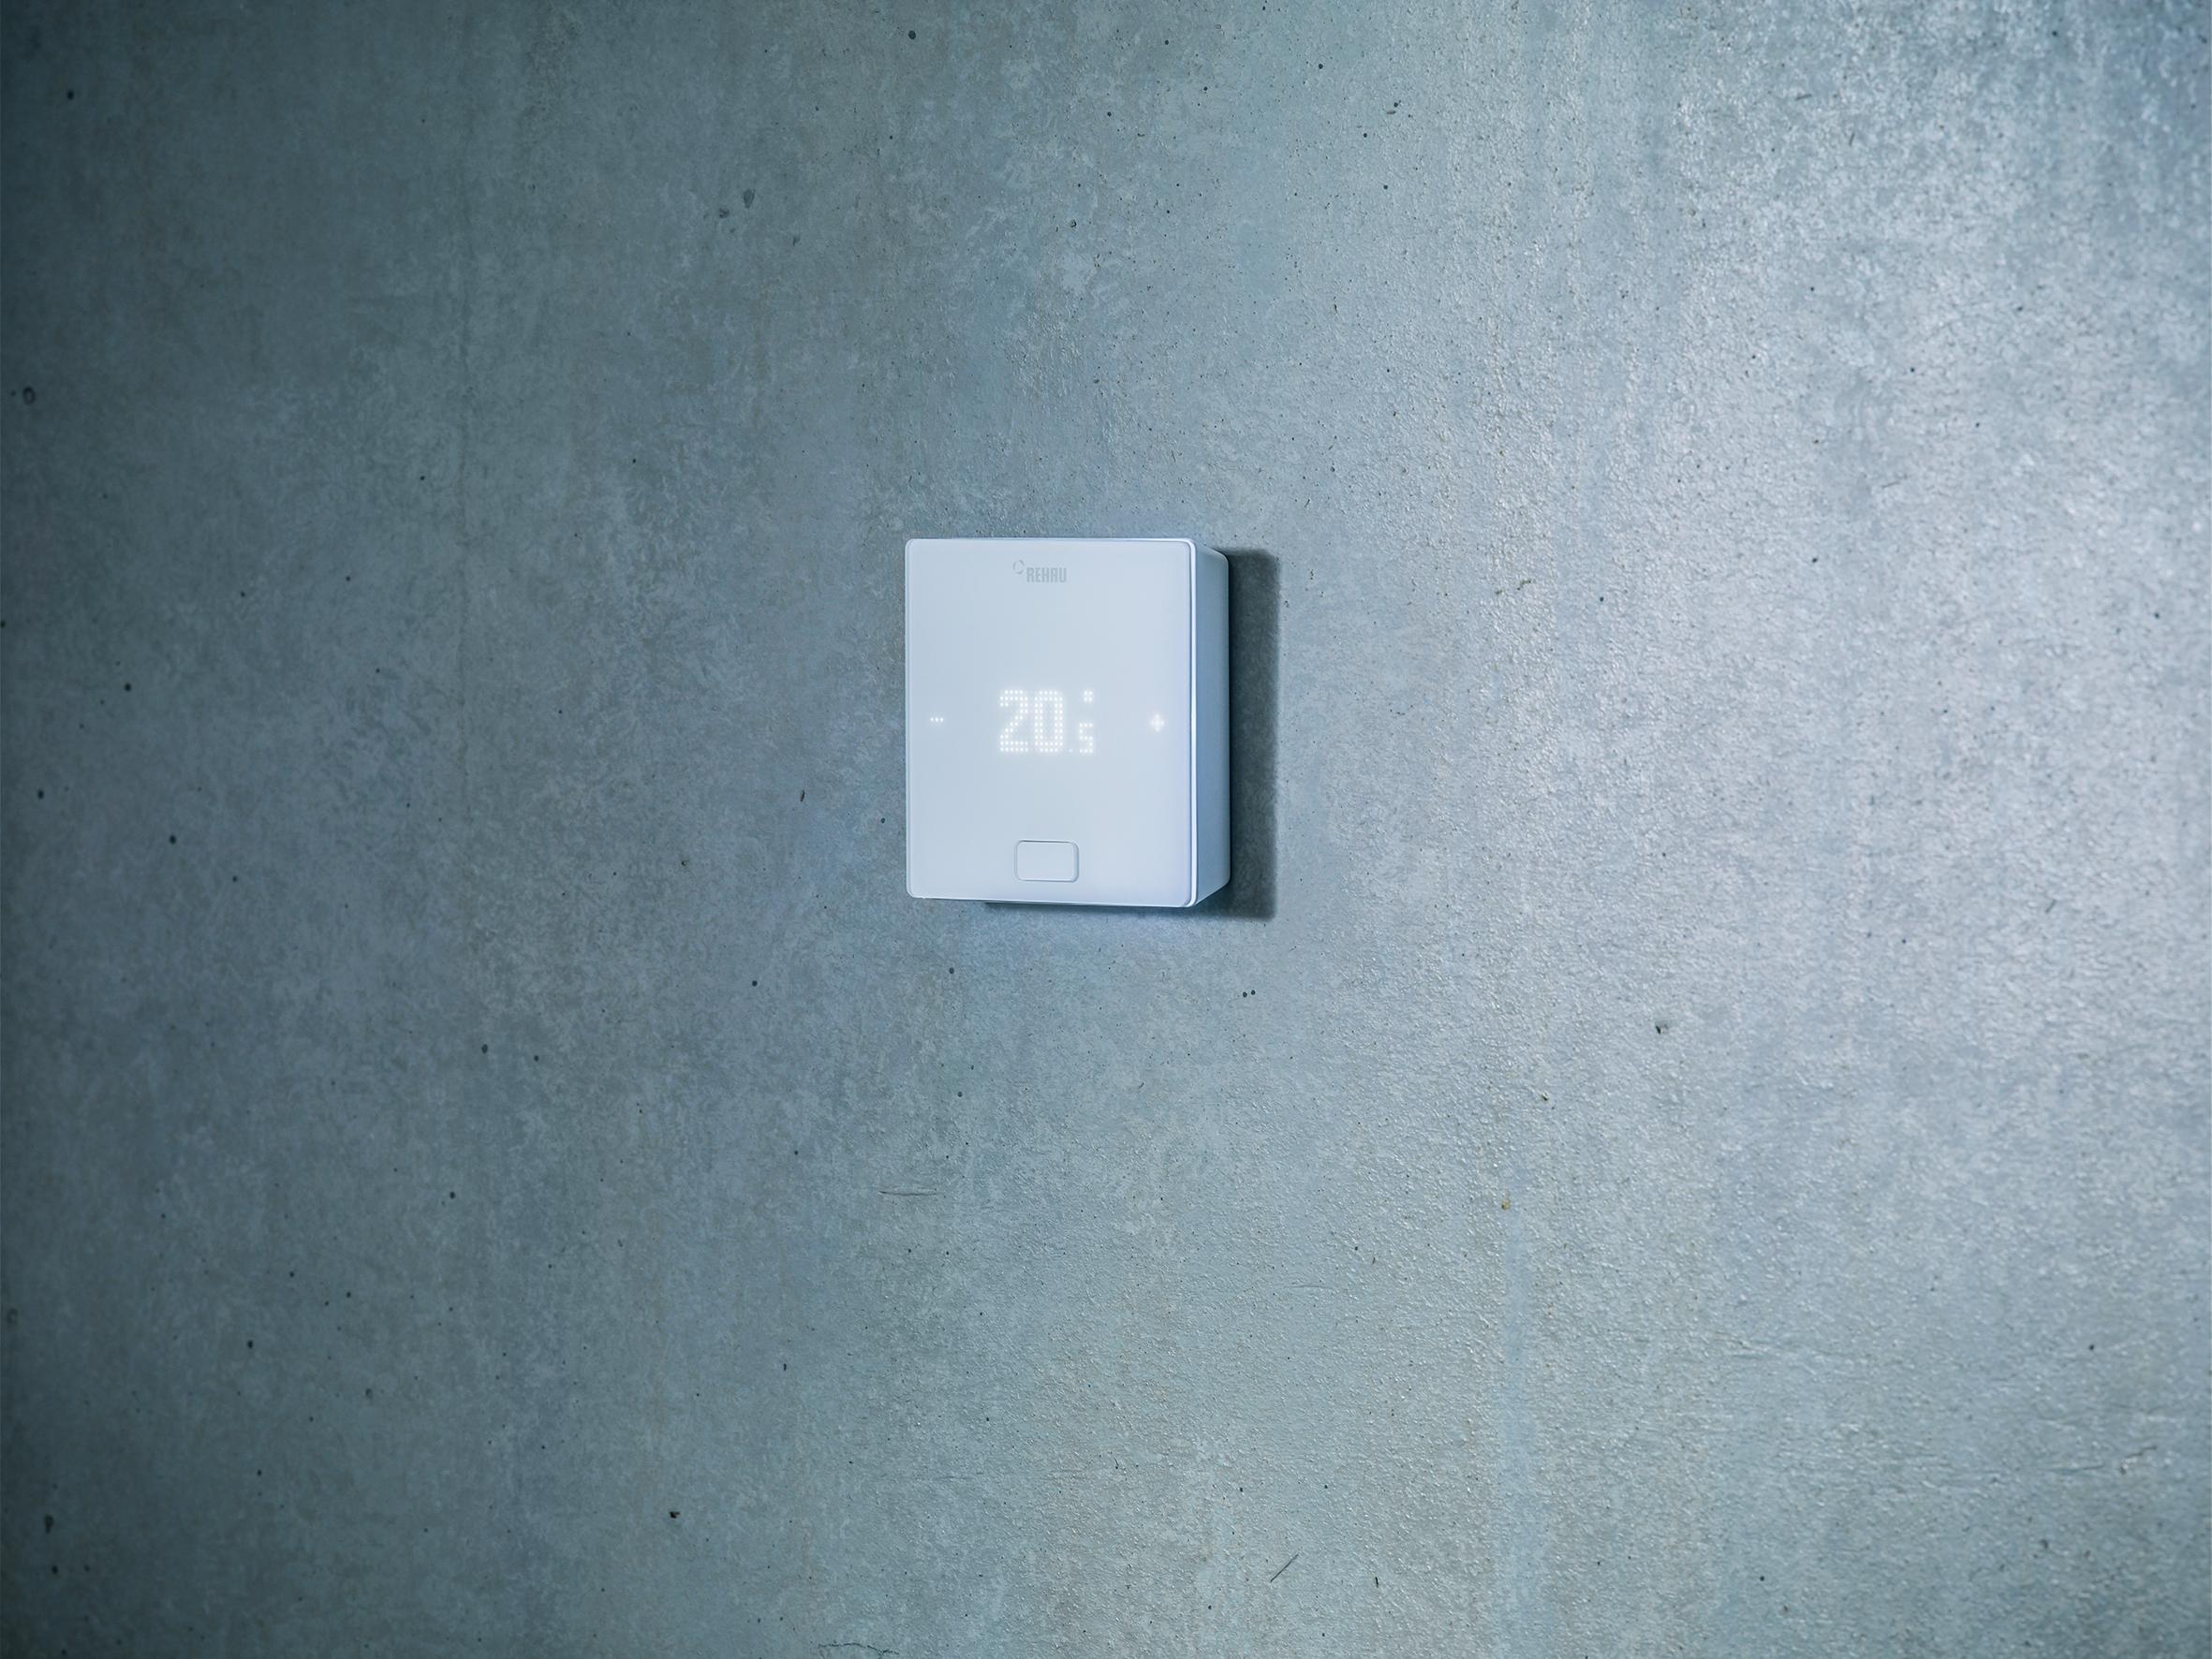 NEA SMART 2.0: Komfort trifft Design, REHAU AG + Co, Pressemitteilung - PresseBox.de